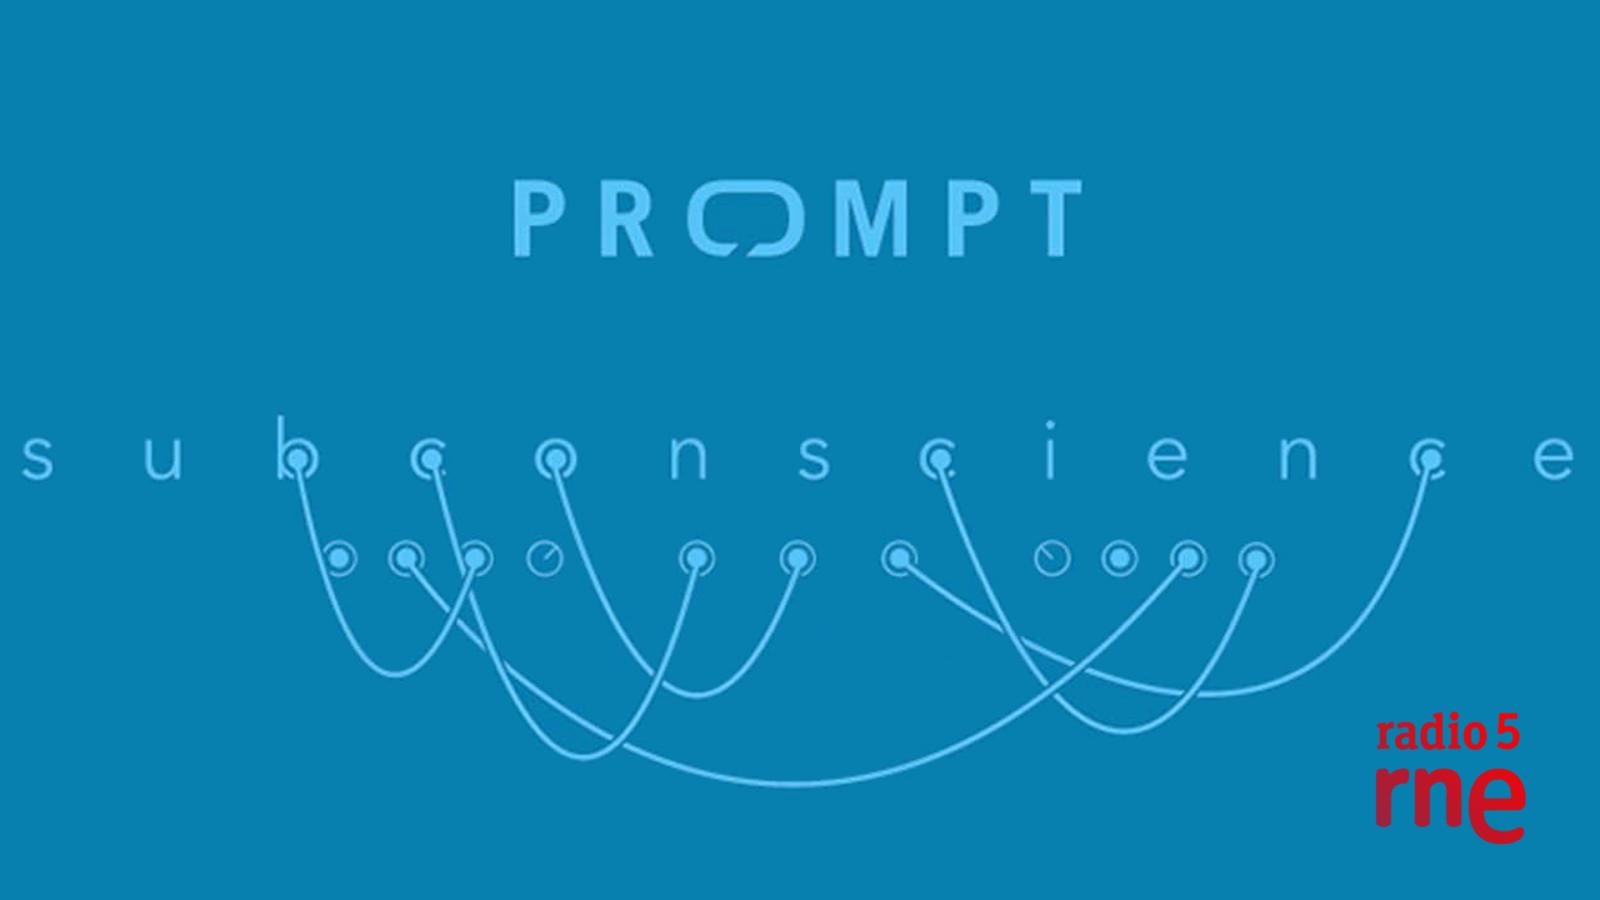 Guía electrónica de bolsillo - Prompt, 'Subconscience' (7Noise) - 19/02/21 - Escuchar ahora